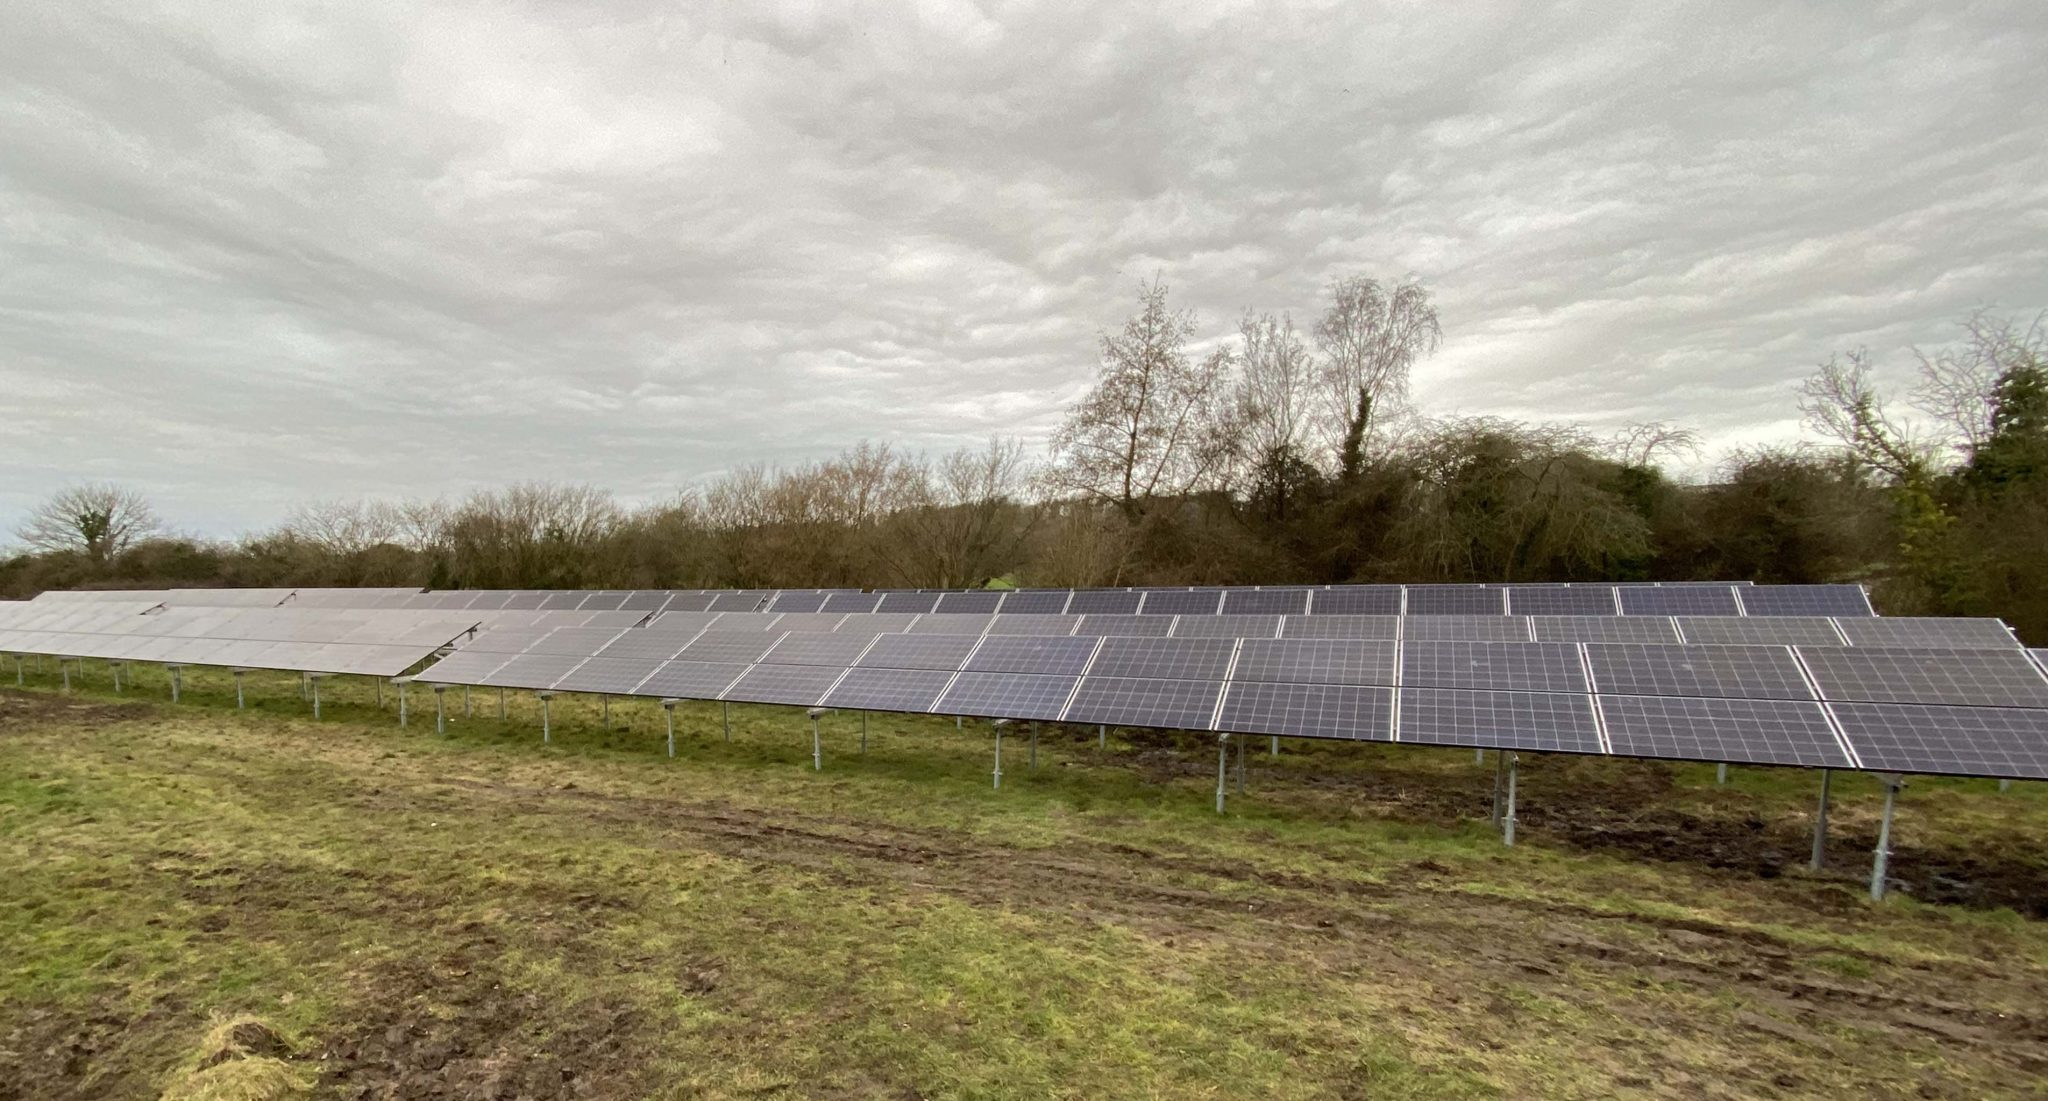 Commercial Solar Installation For Athelhampton